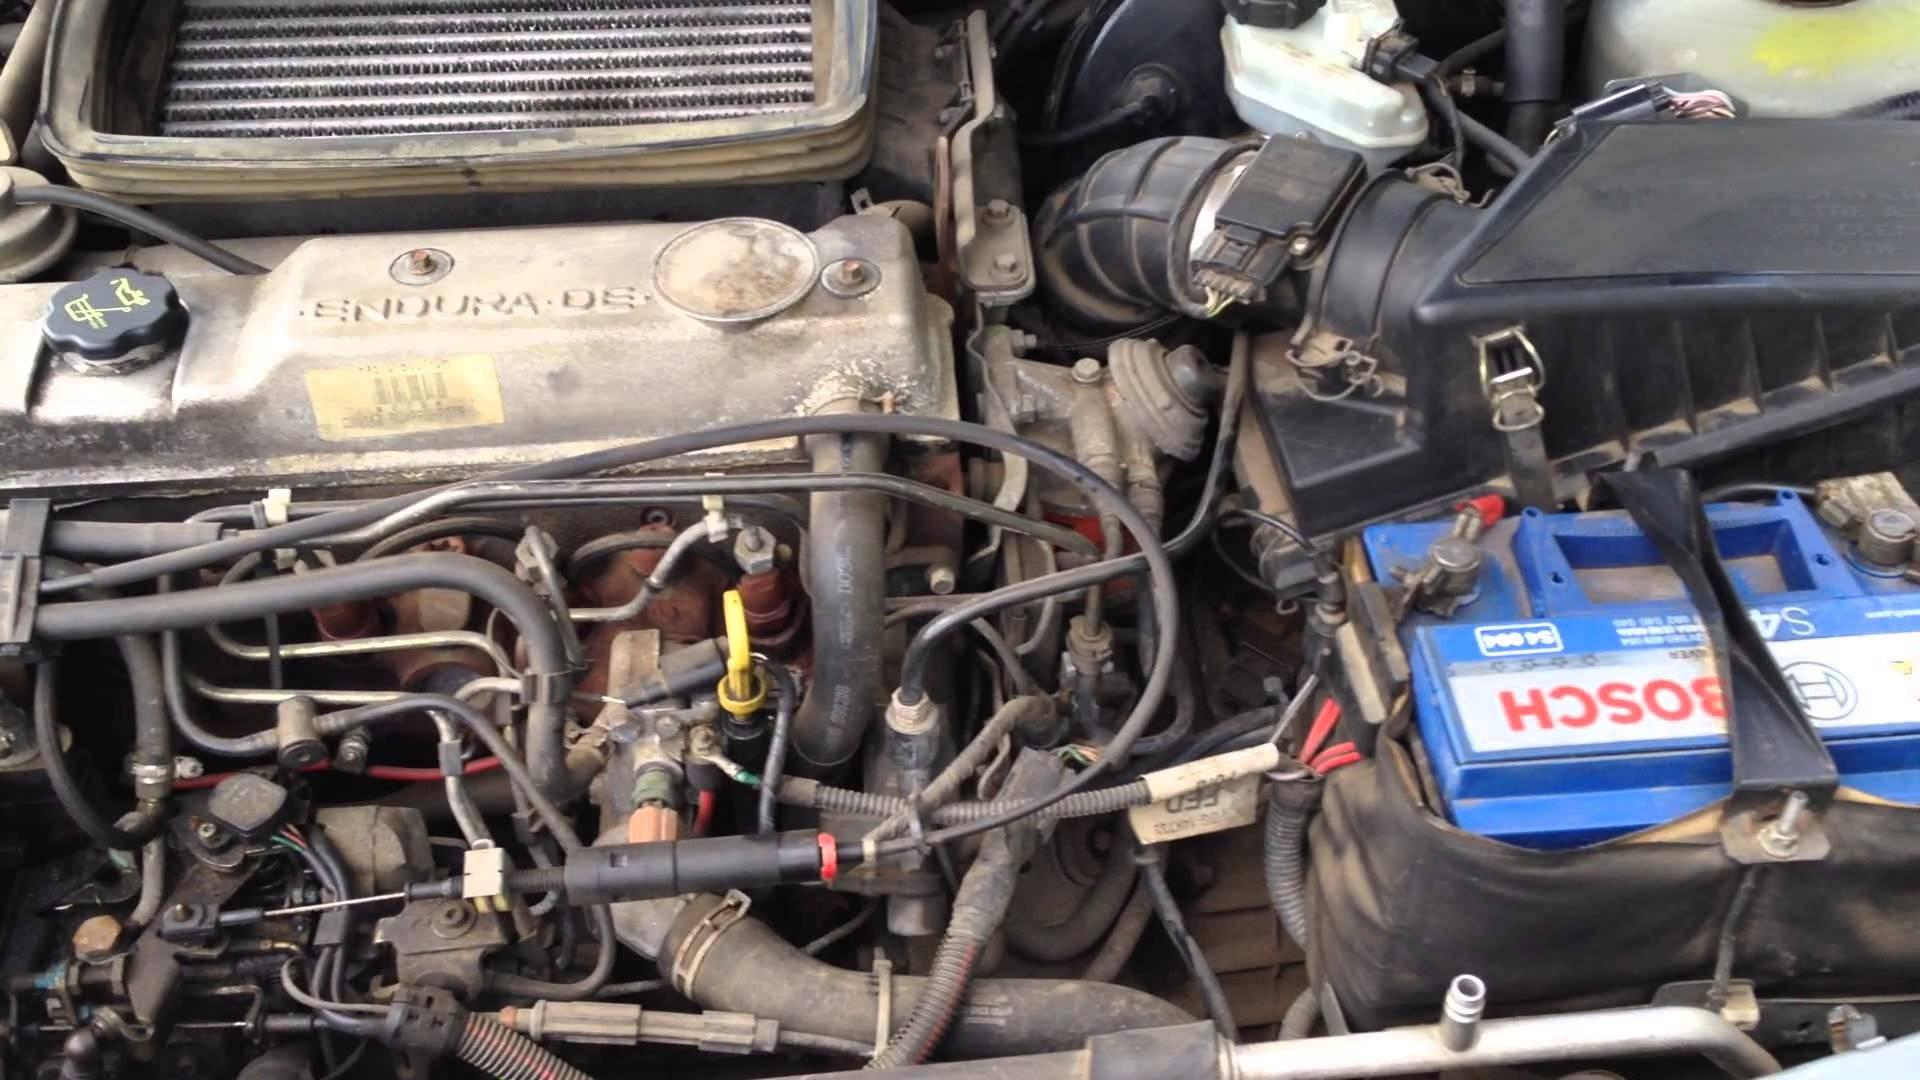 Mondeo Engine Diagram ford Endura De Turbo Diesel Engine Of Mondeo Engine Diagram